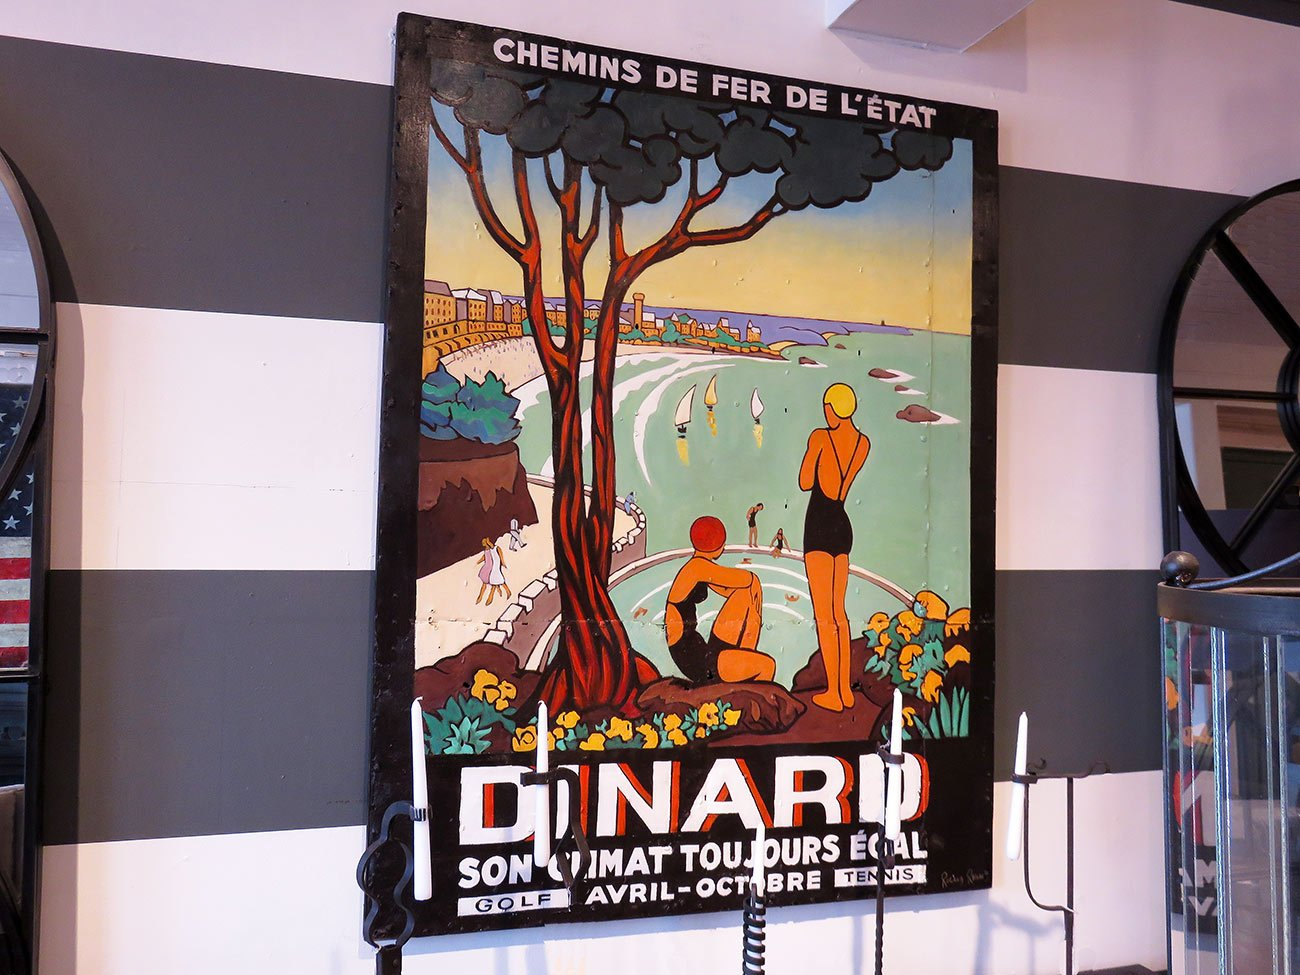 french dinard wall art